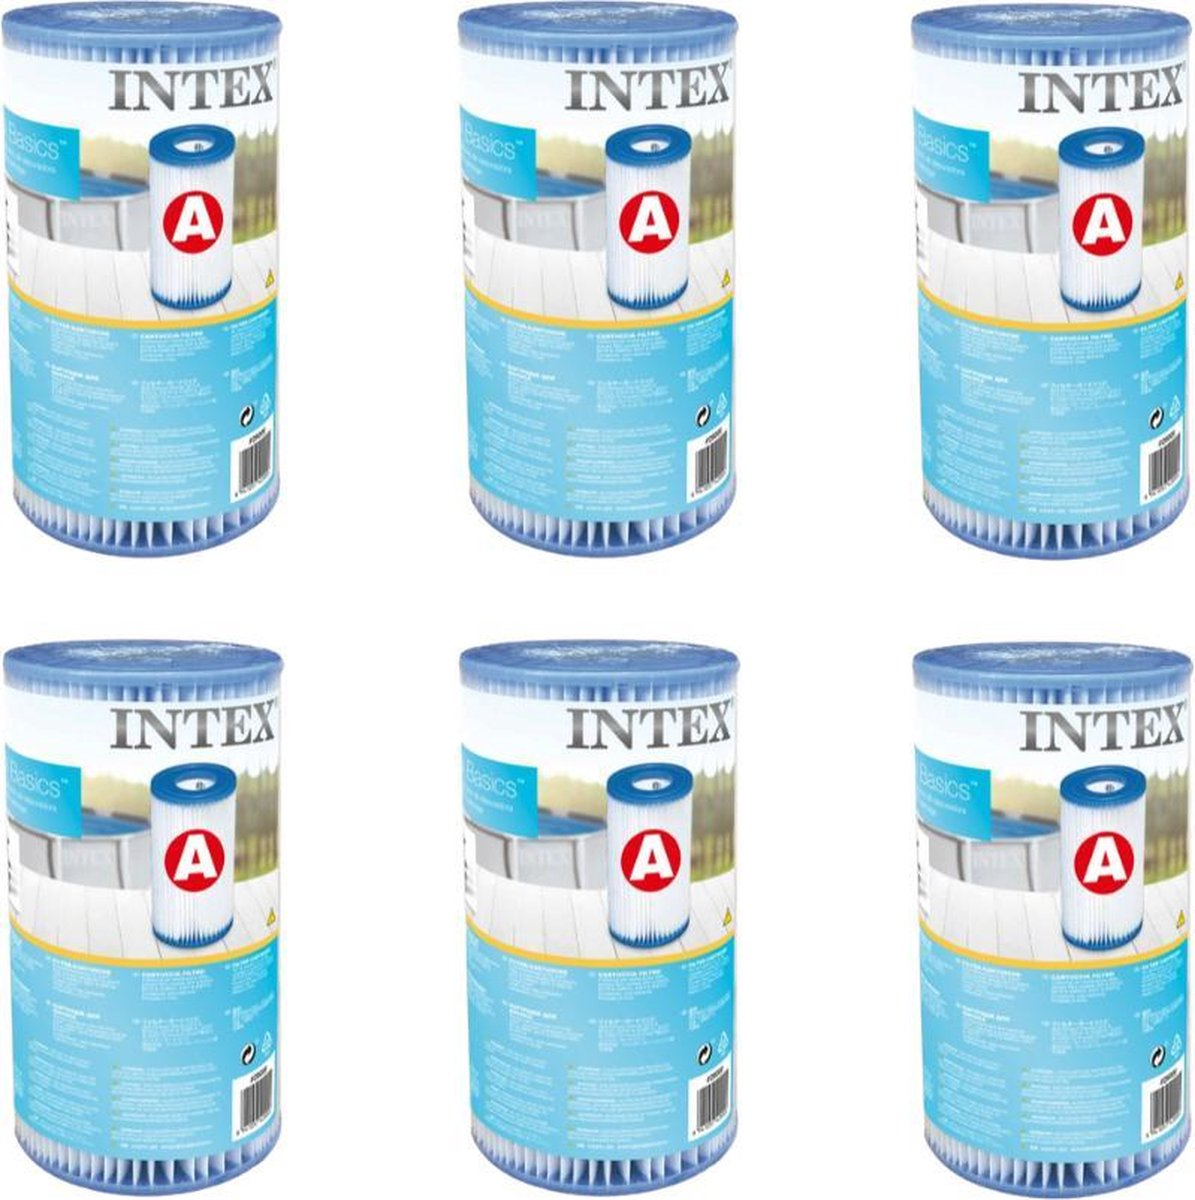 Intex 6x Filter A - Zwembadfilter